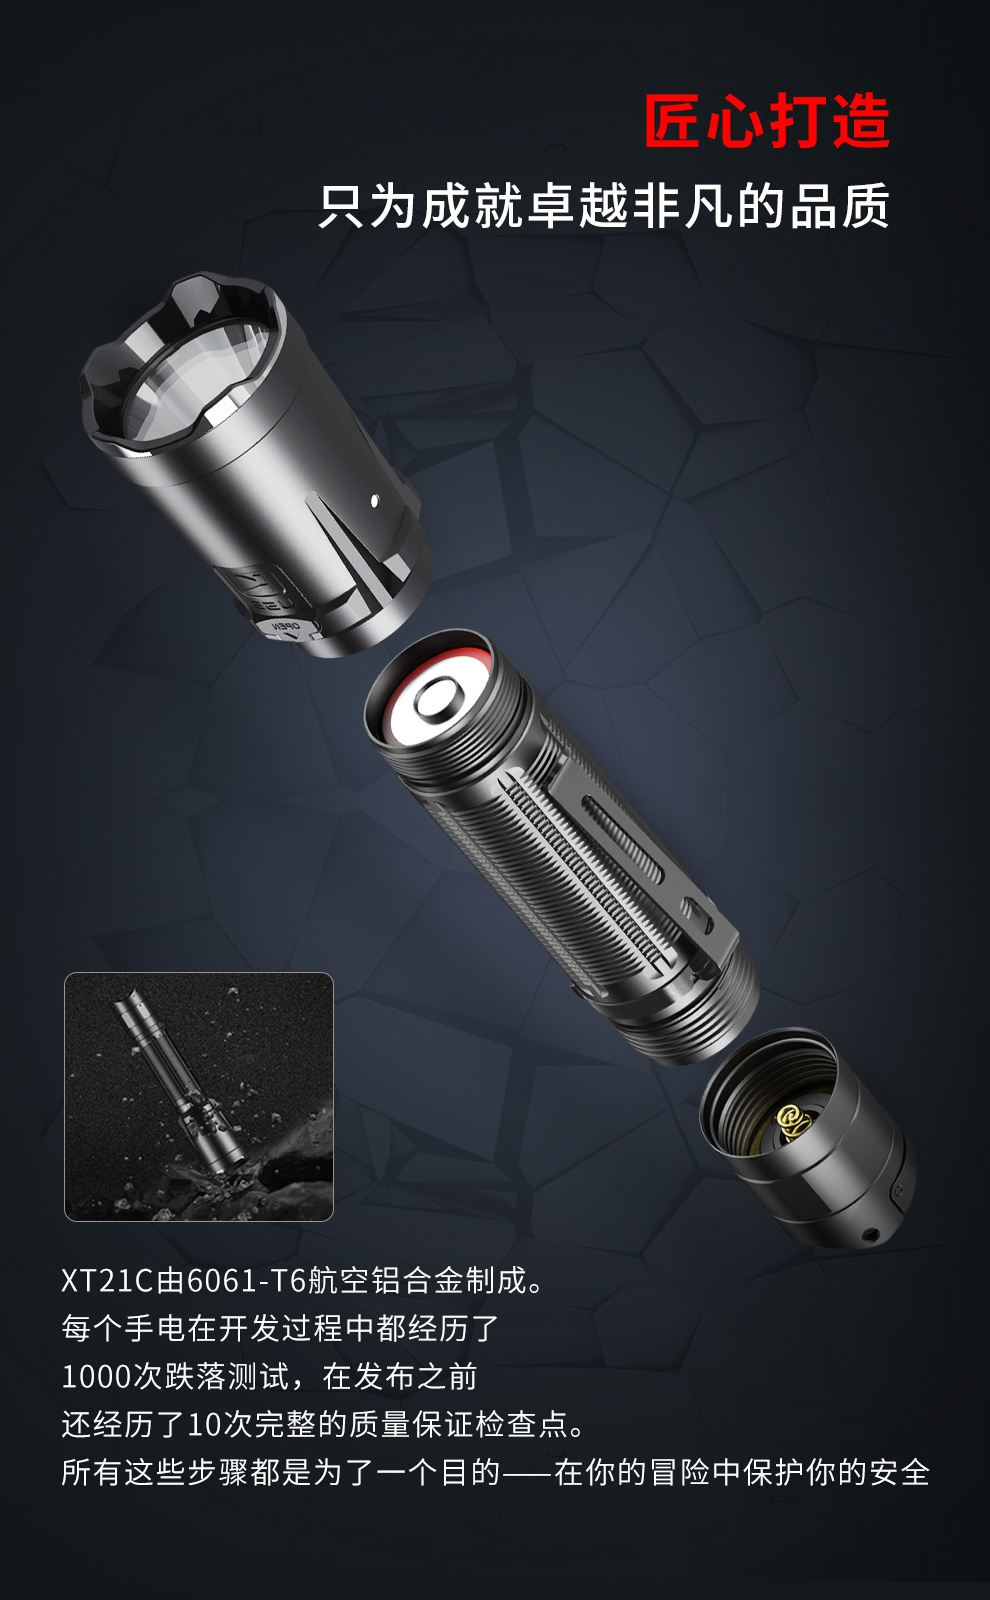 KLARUS XT21C 戰術手電筒 3200流明 -12